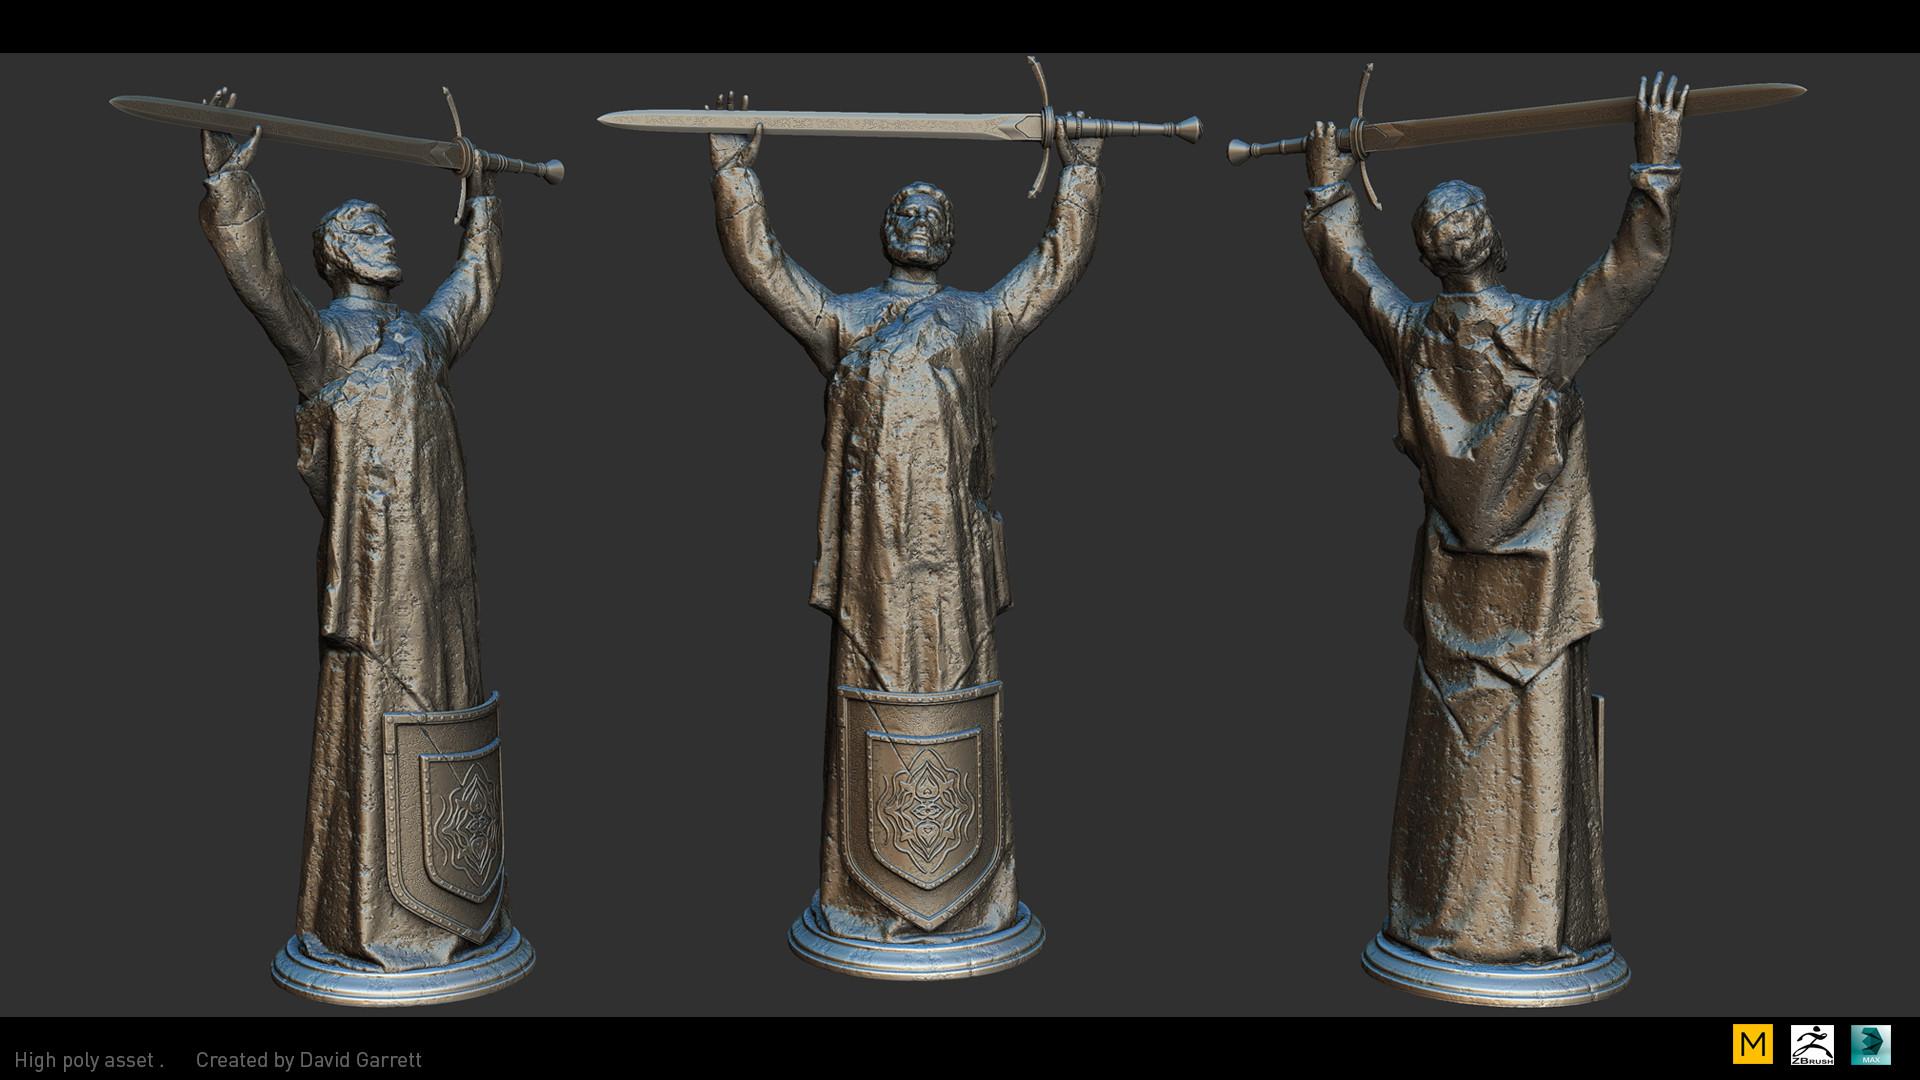 David garrett n3094311 high poly shot statue